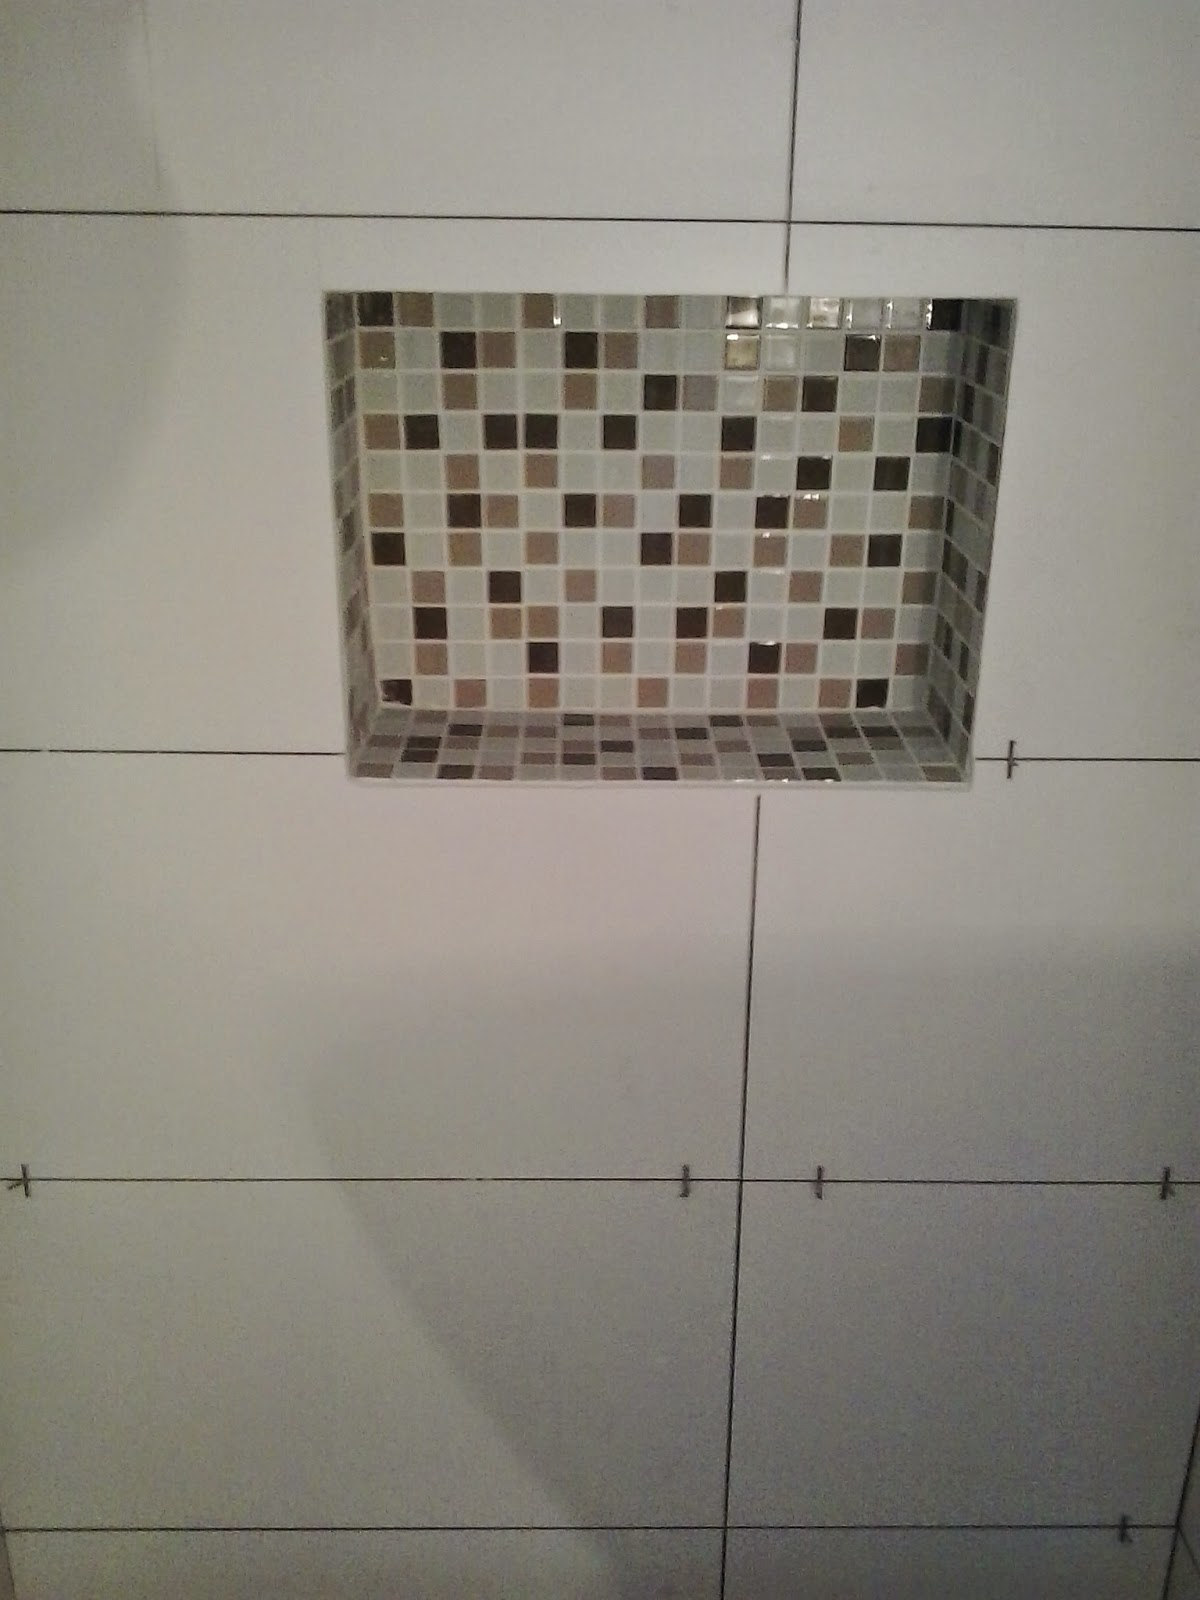 #5B5045 quinta feira 23 de outubro de 2014 1200x1600 px pia de banheiro bloco cad